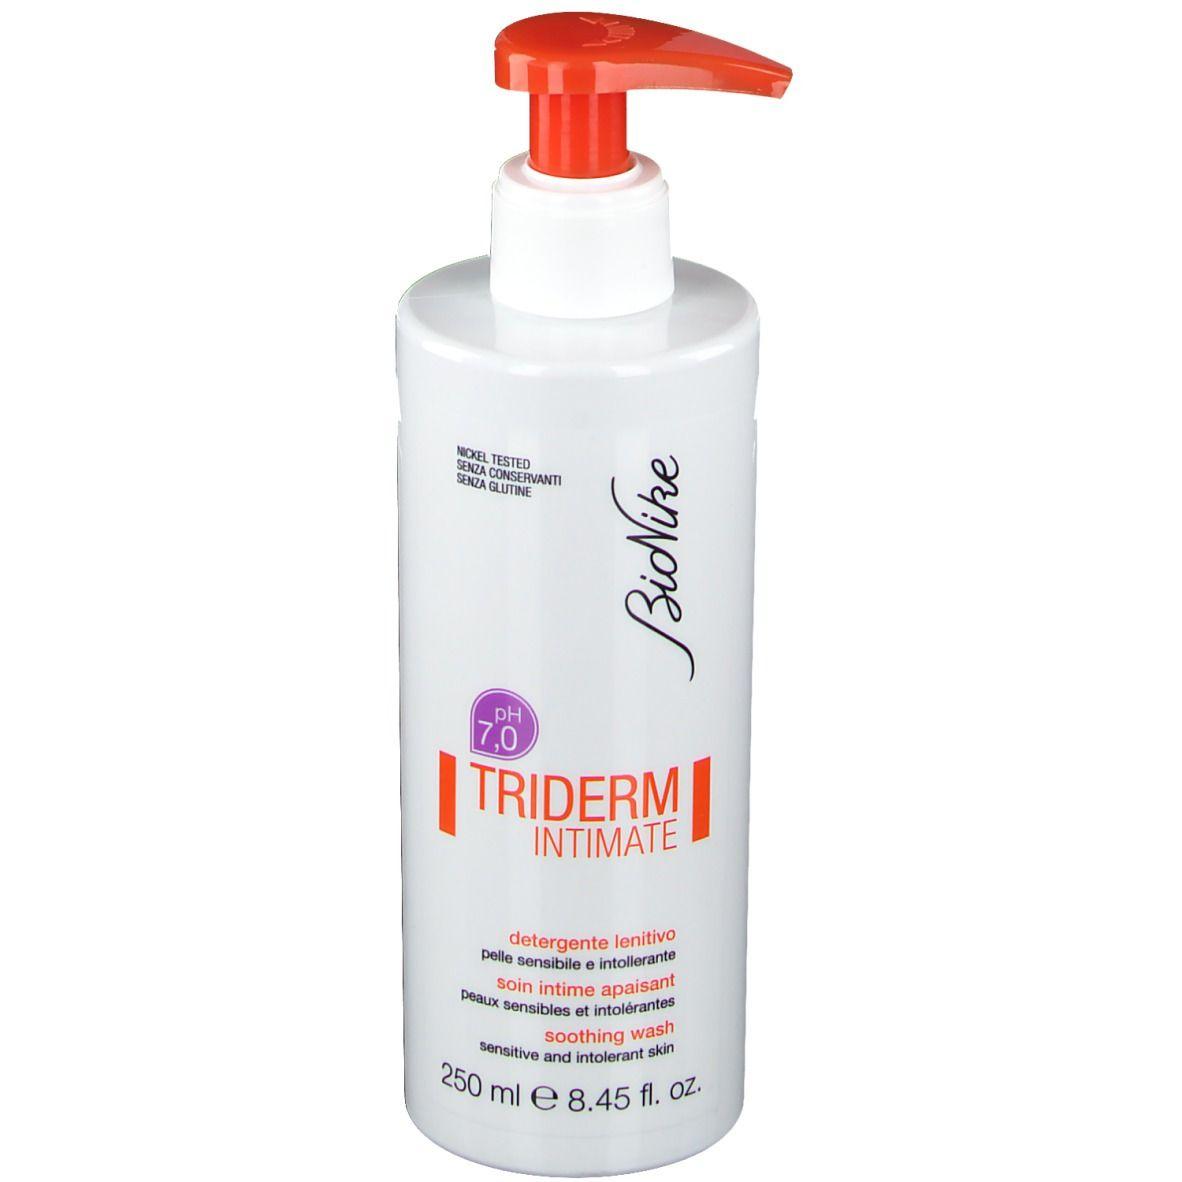 BioNike TRIDERM INTIMATE Soin intime apaisant pH 7.0 ml gel nettoyant